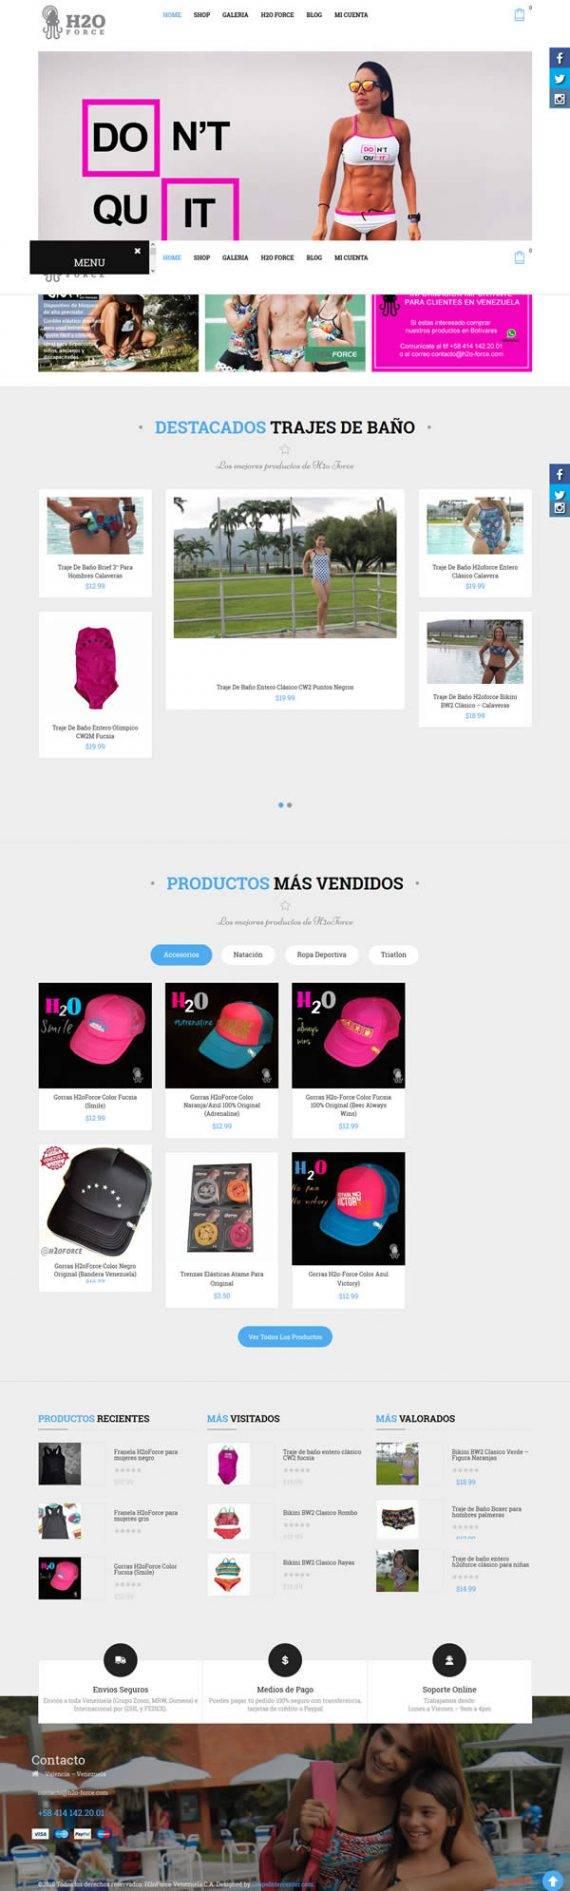 H2o-Force - Diseño web tienda virtual woocommerce portafolio